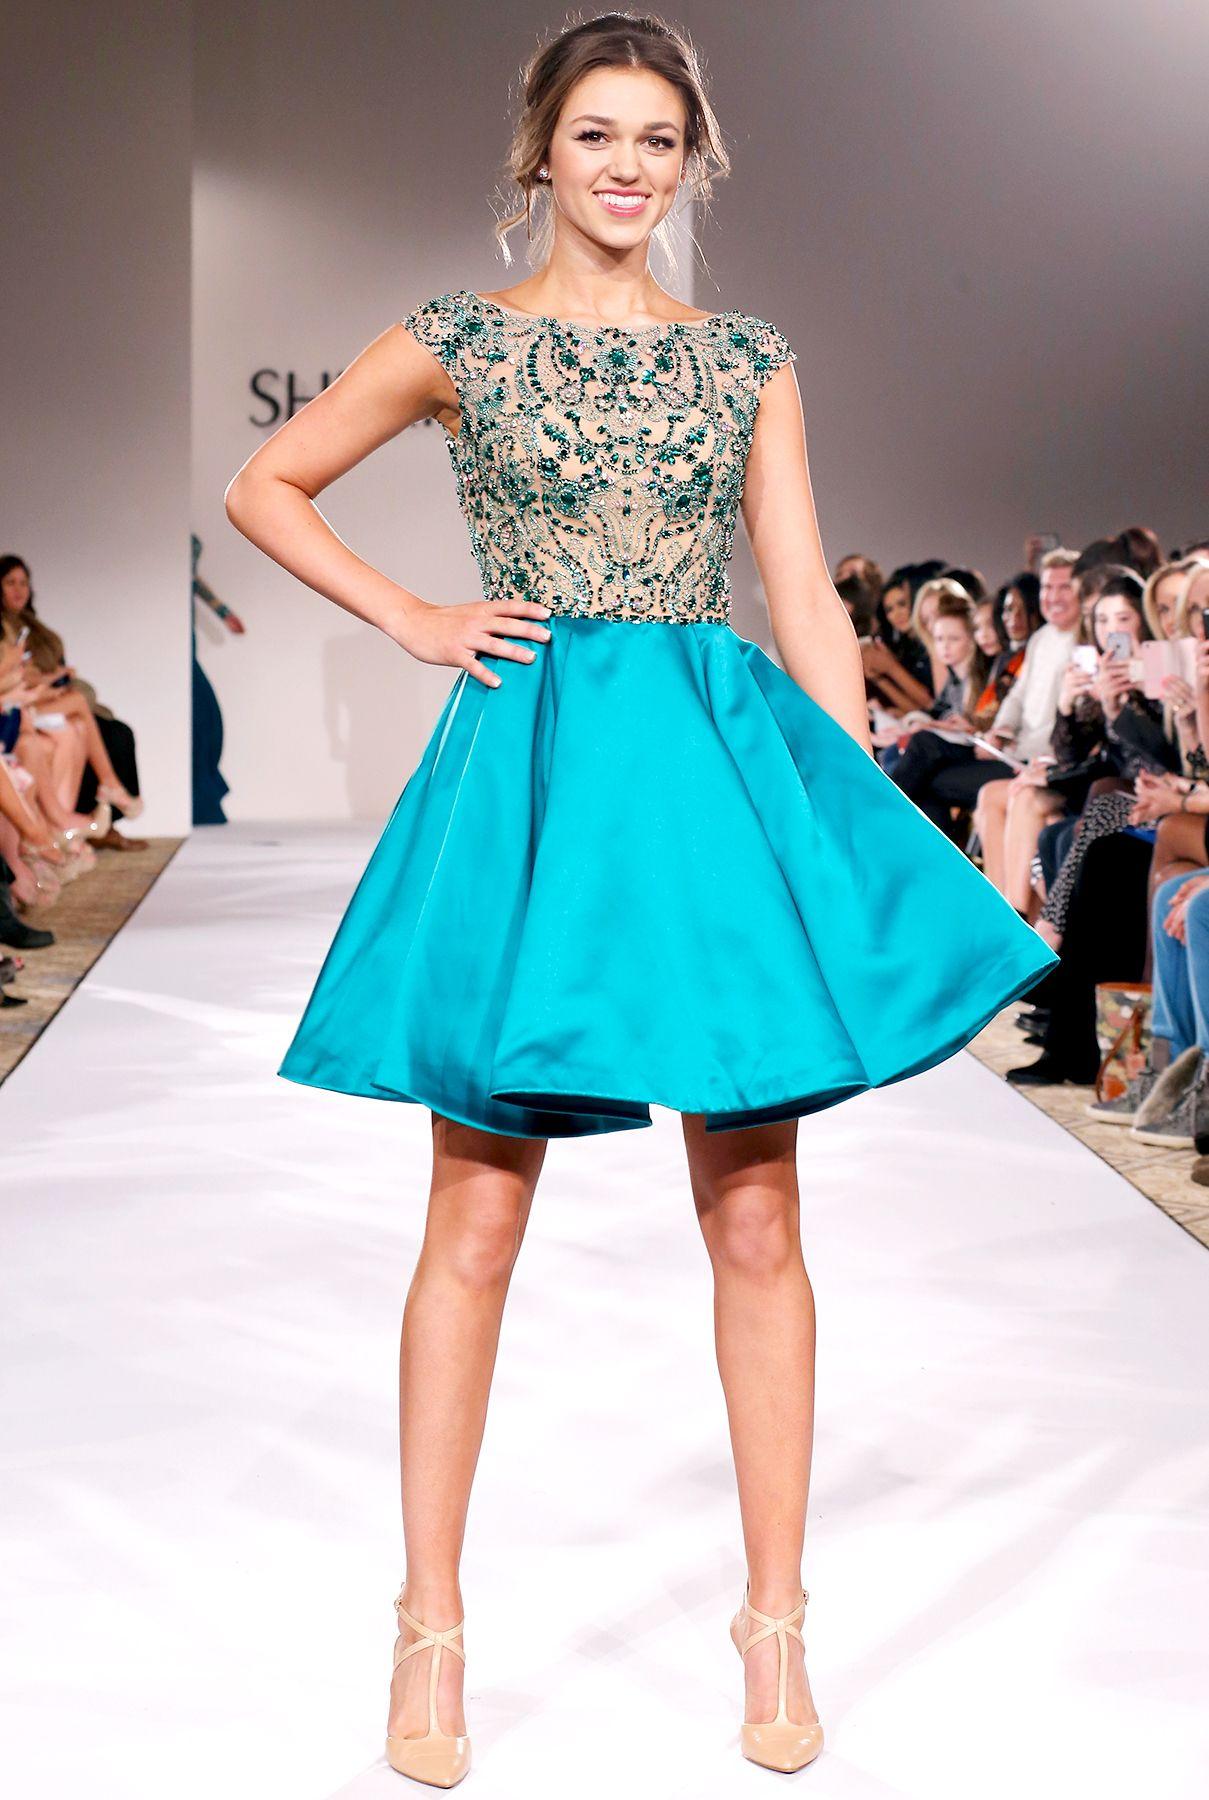 79bea467ec6 Duck Dynasty star Sadie Robertson walked the runway at the Sherri Hill show  during Mercedes-Benz New York Fashion Week on Feb. 19